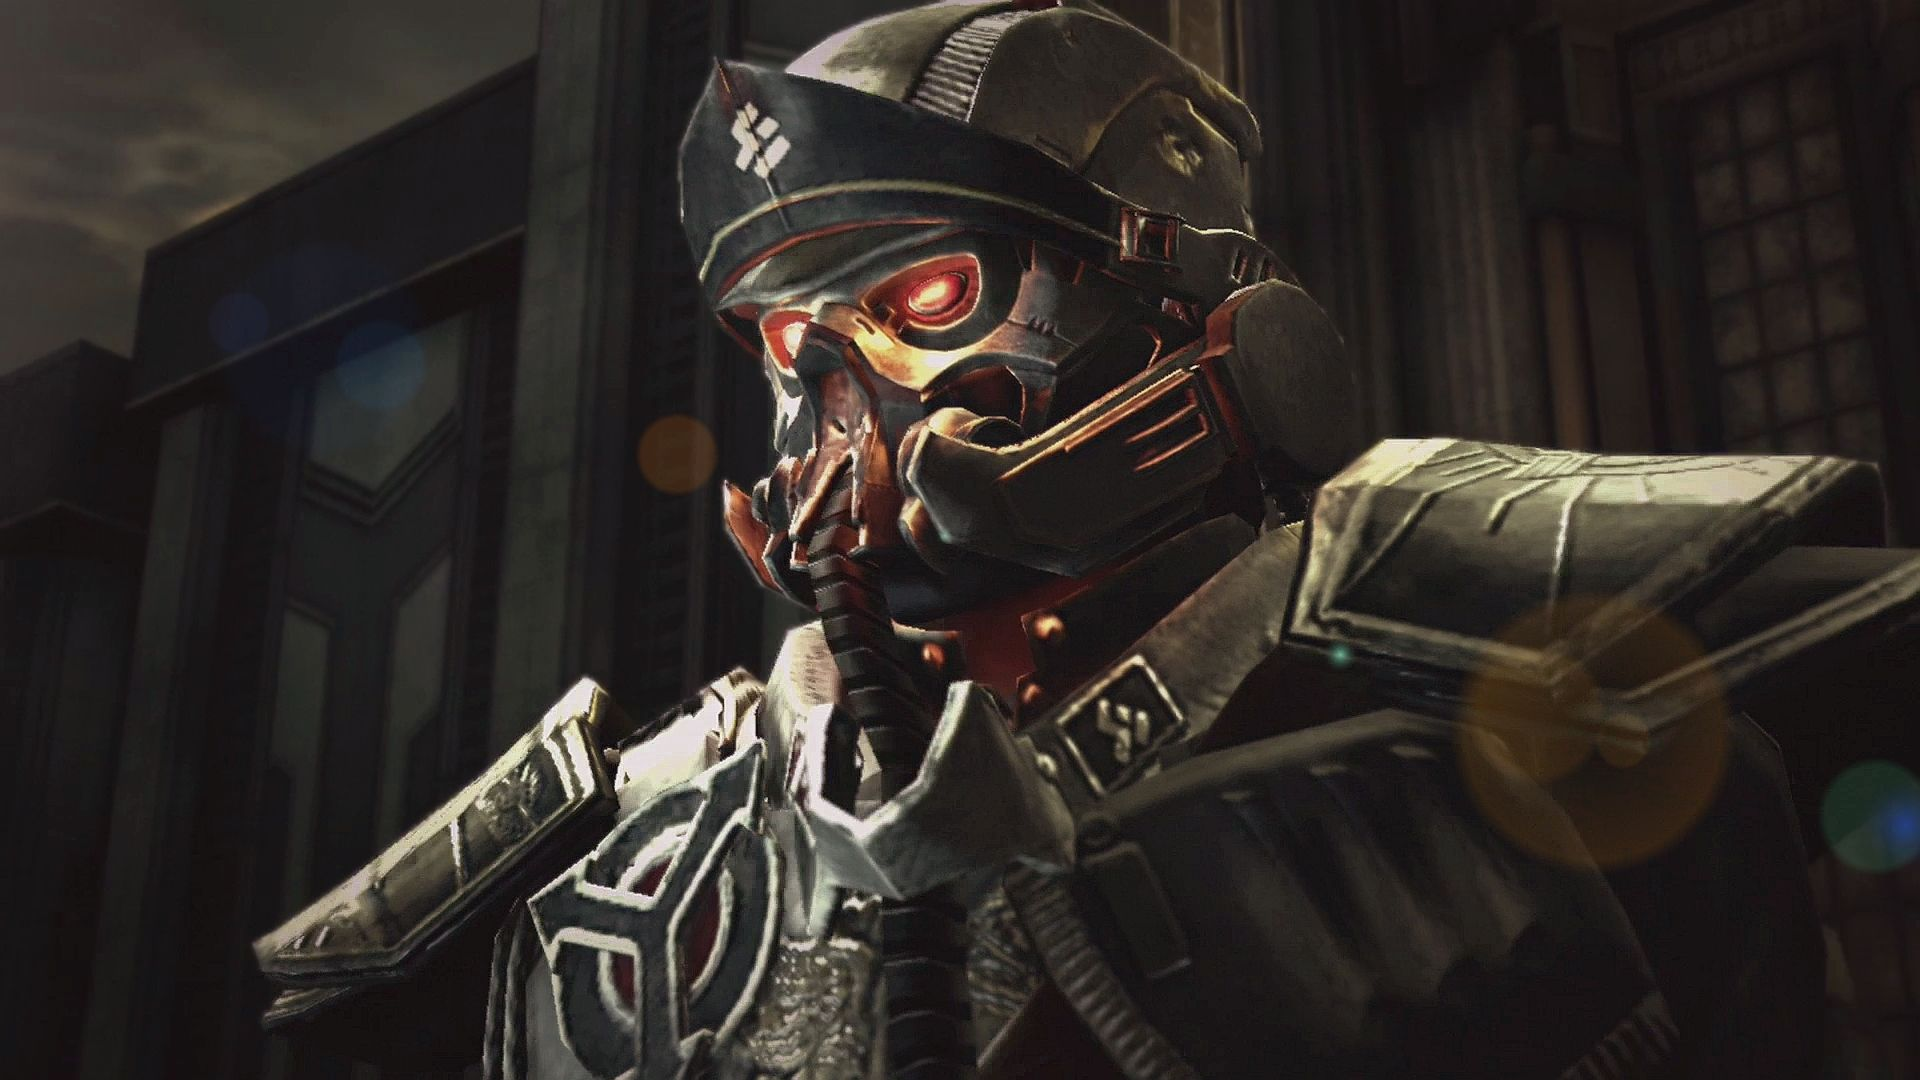 Destiny wallpaper bungie destiny artwork2 jpg - Adorable Killzone Soldier Look Eyes Armor Wallpaper Kuff Games